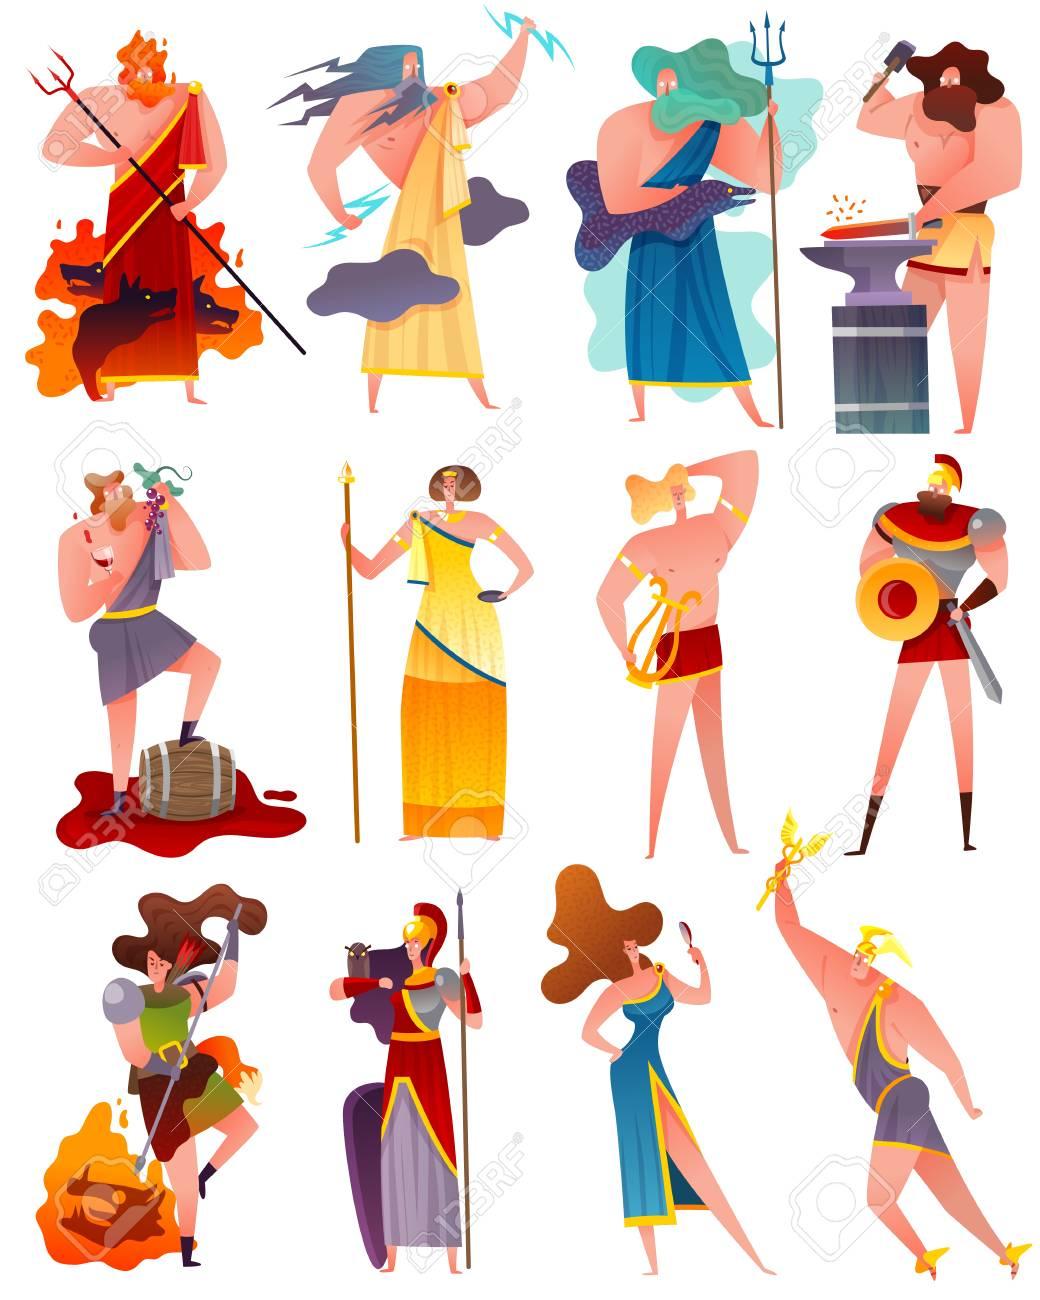 Mythology cartoon set of famous ancient greece gods and goddess so as apollo poseidon artemis athena demeter jupiter flat vector illustration - 101862363